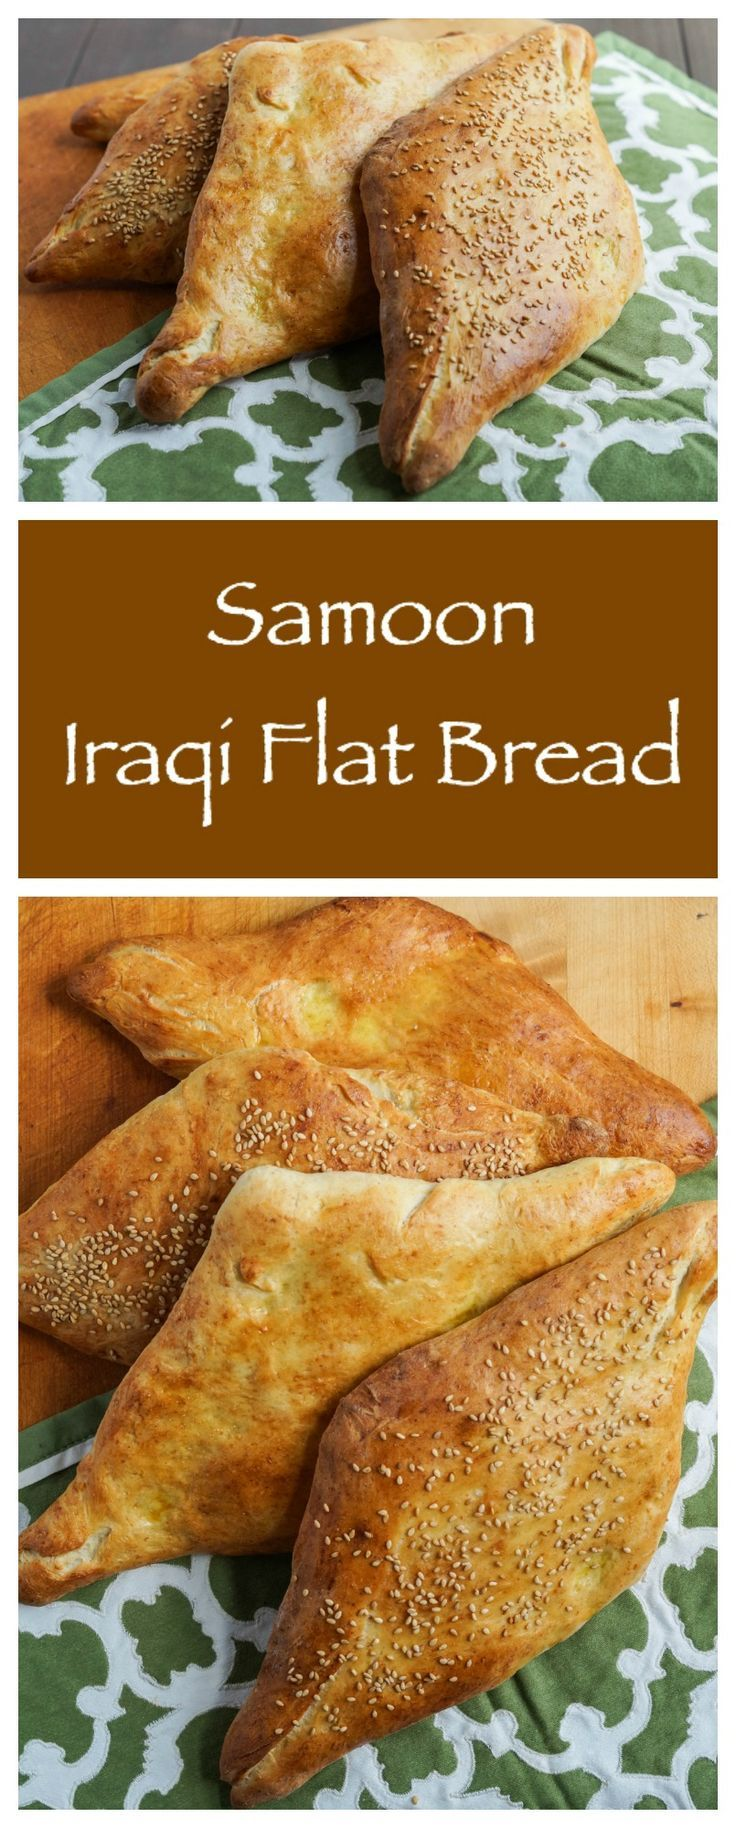 Samoon a recipe for iraqi flat bread flat bread recipes and samoon iraqi flat bread multicultural kid blogs forumfinder Images